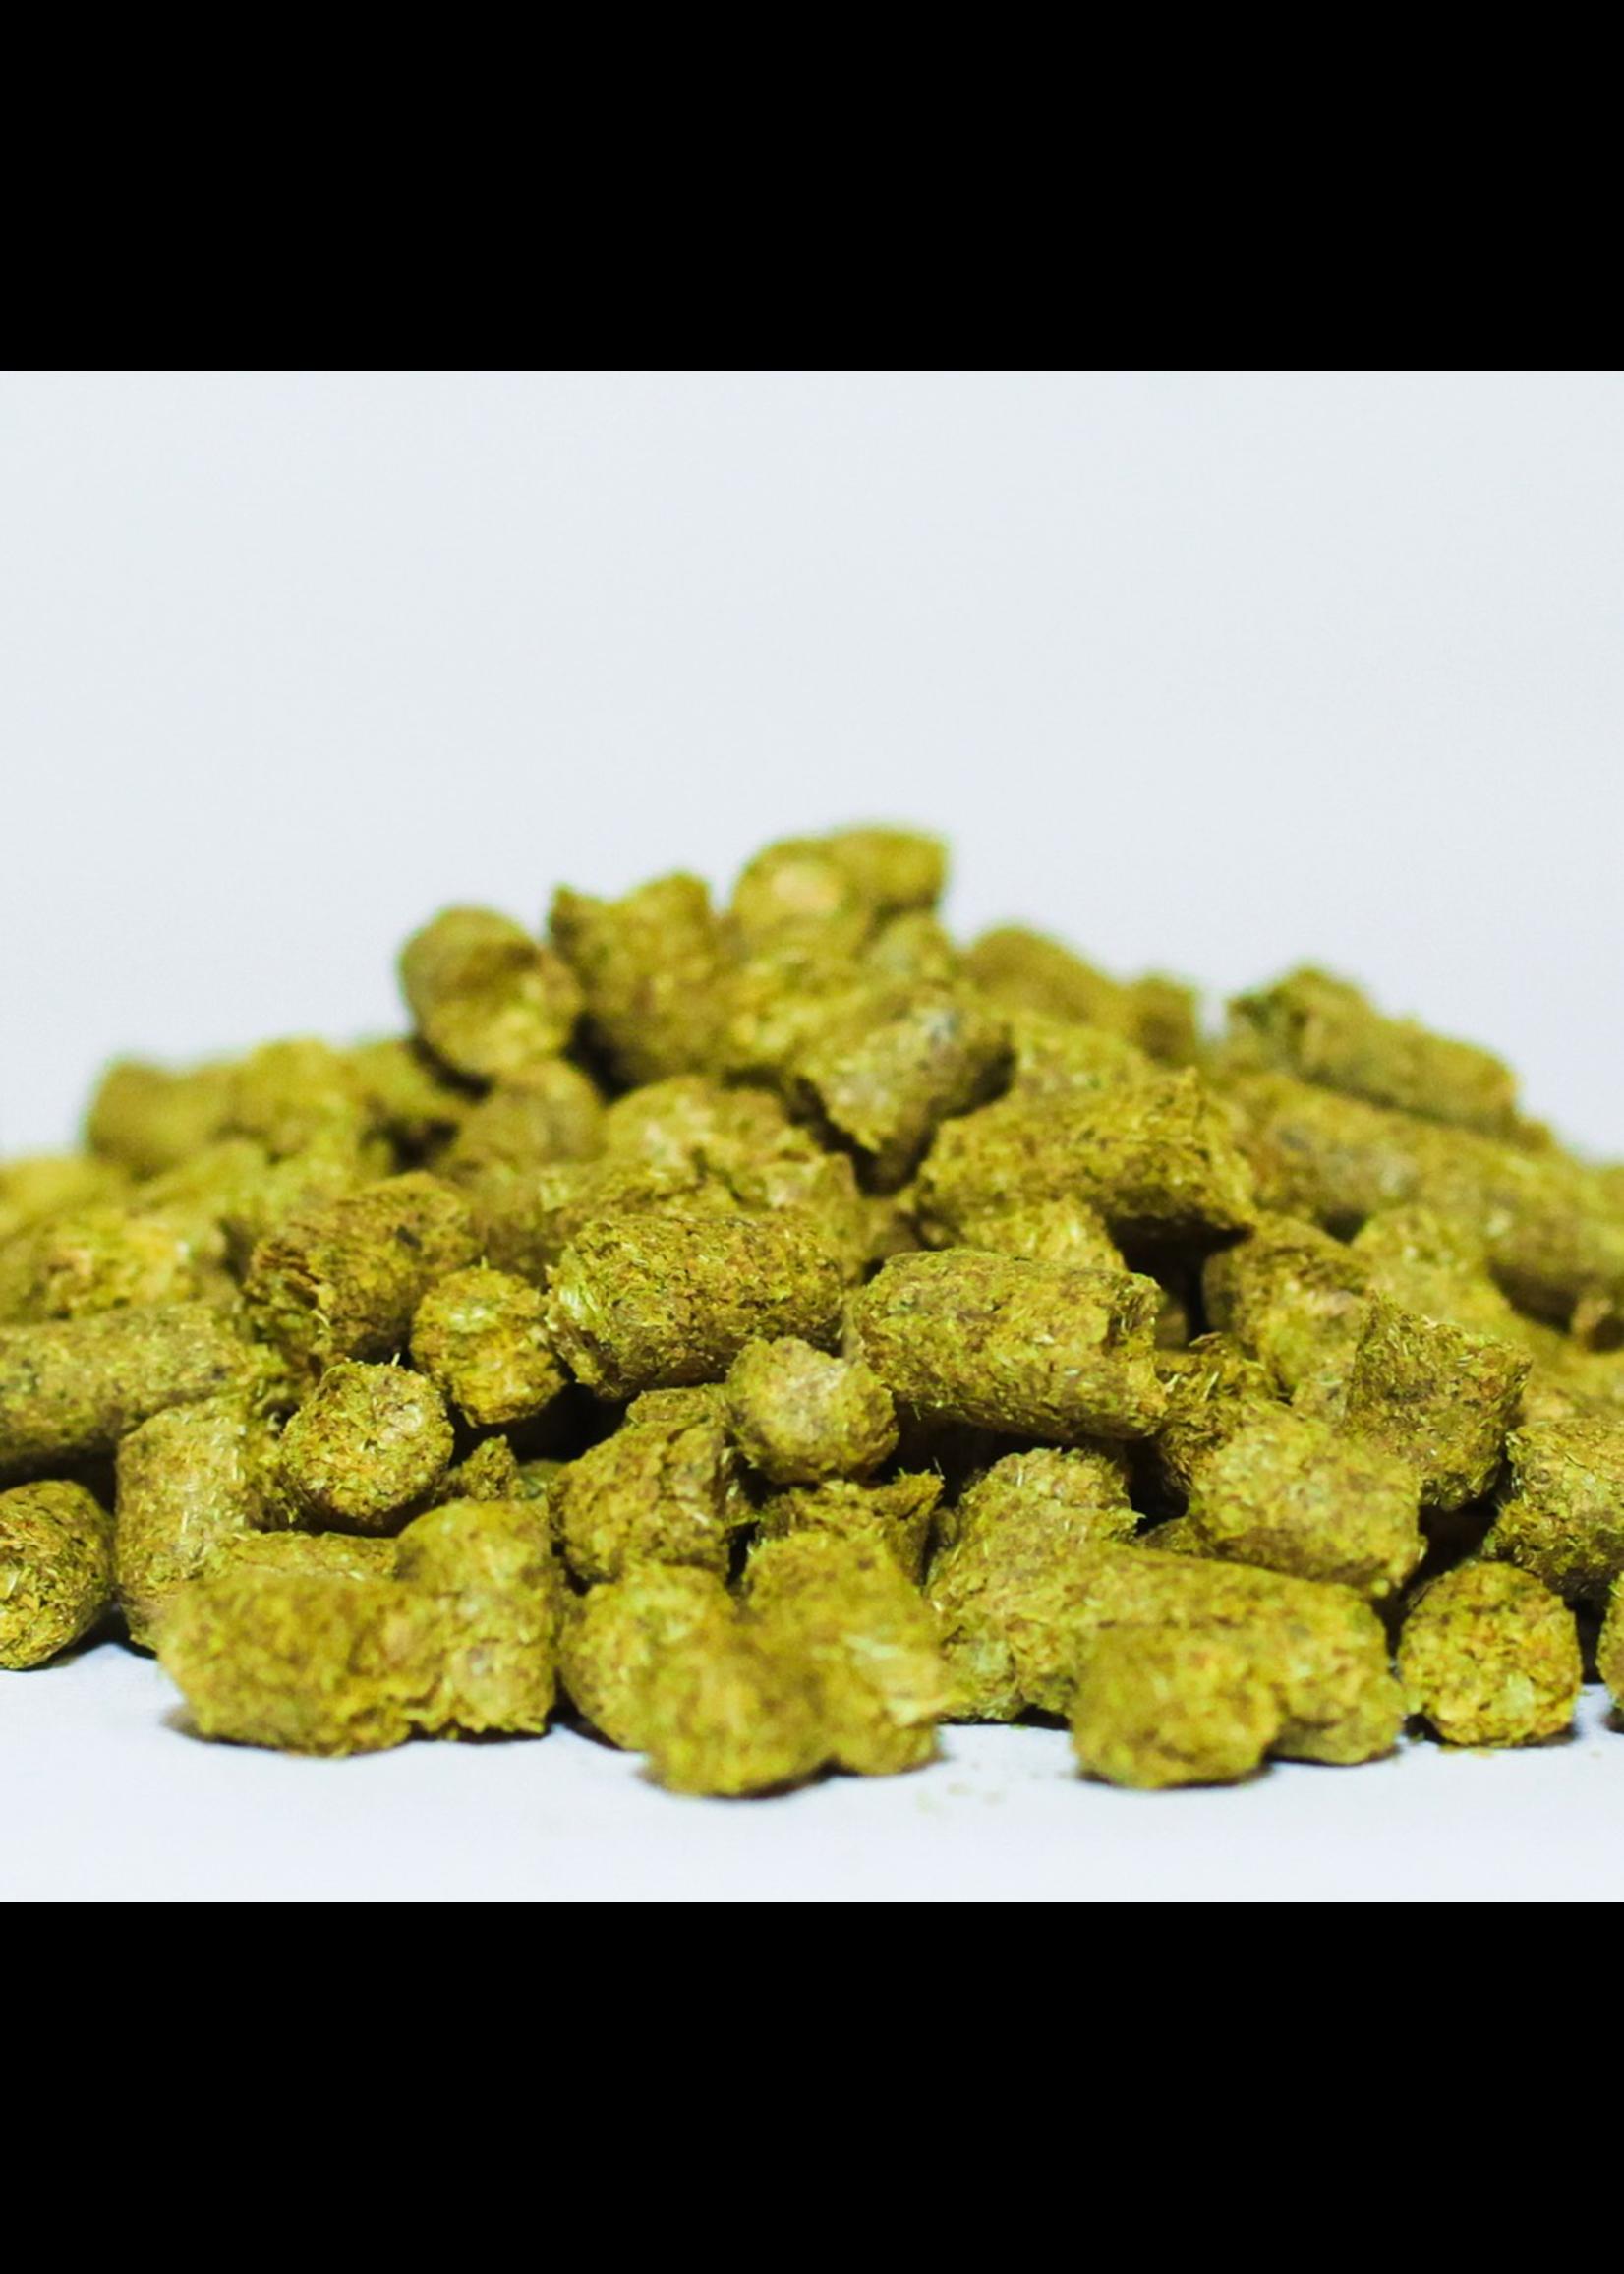 Hops Lemondrop Hops (US) - Pellets - 1 oz